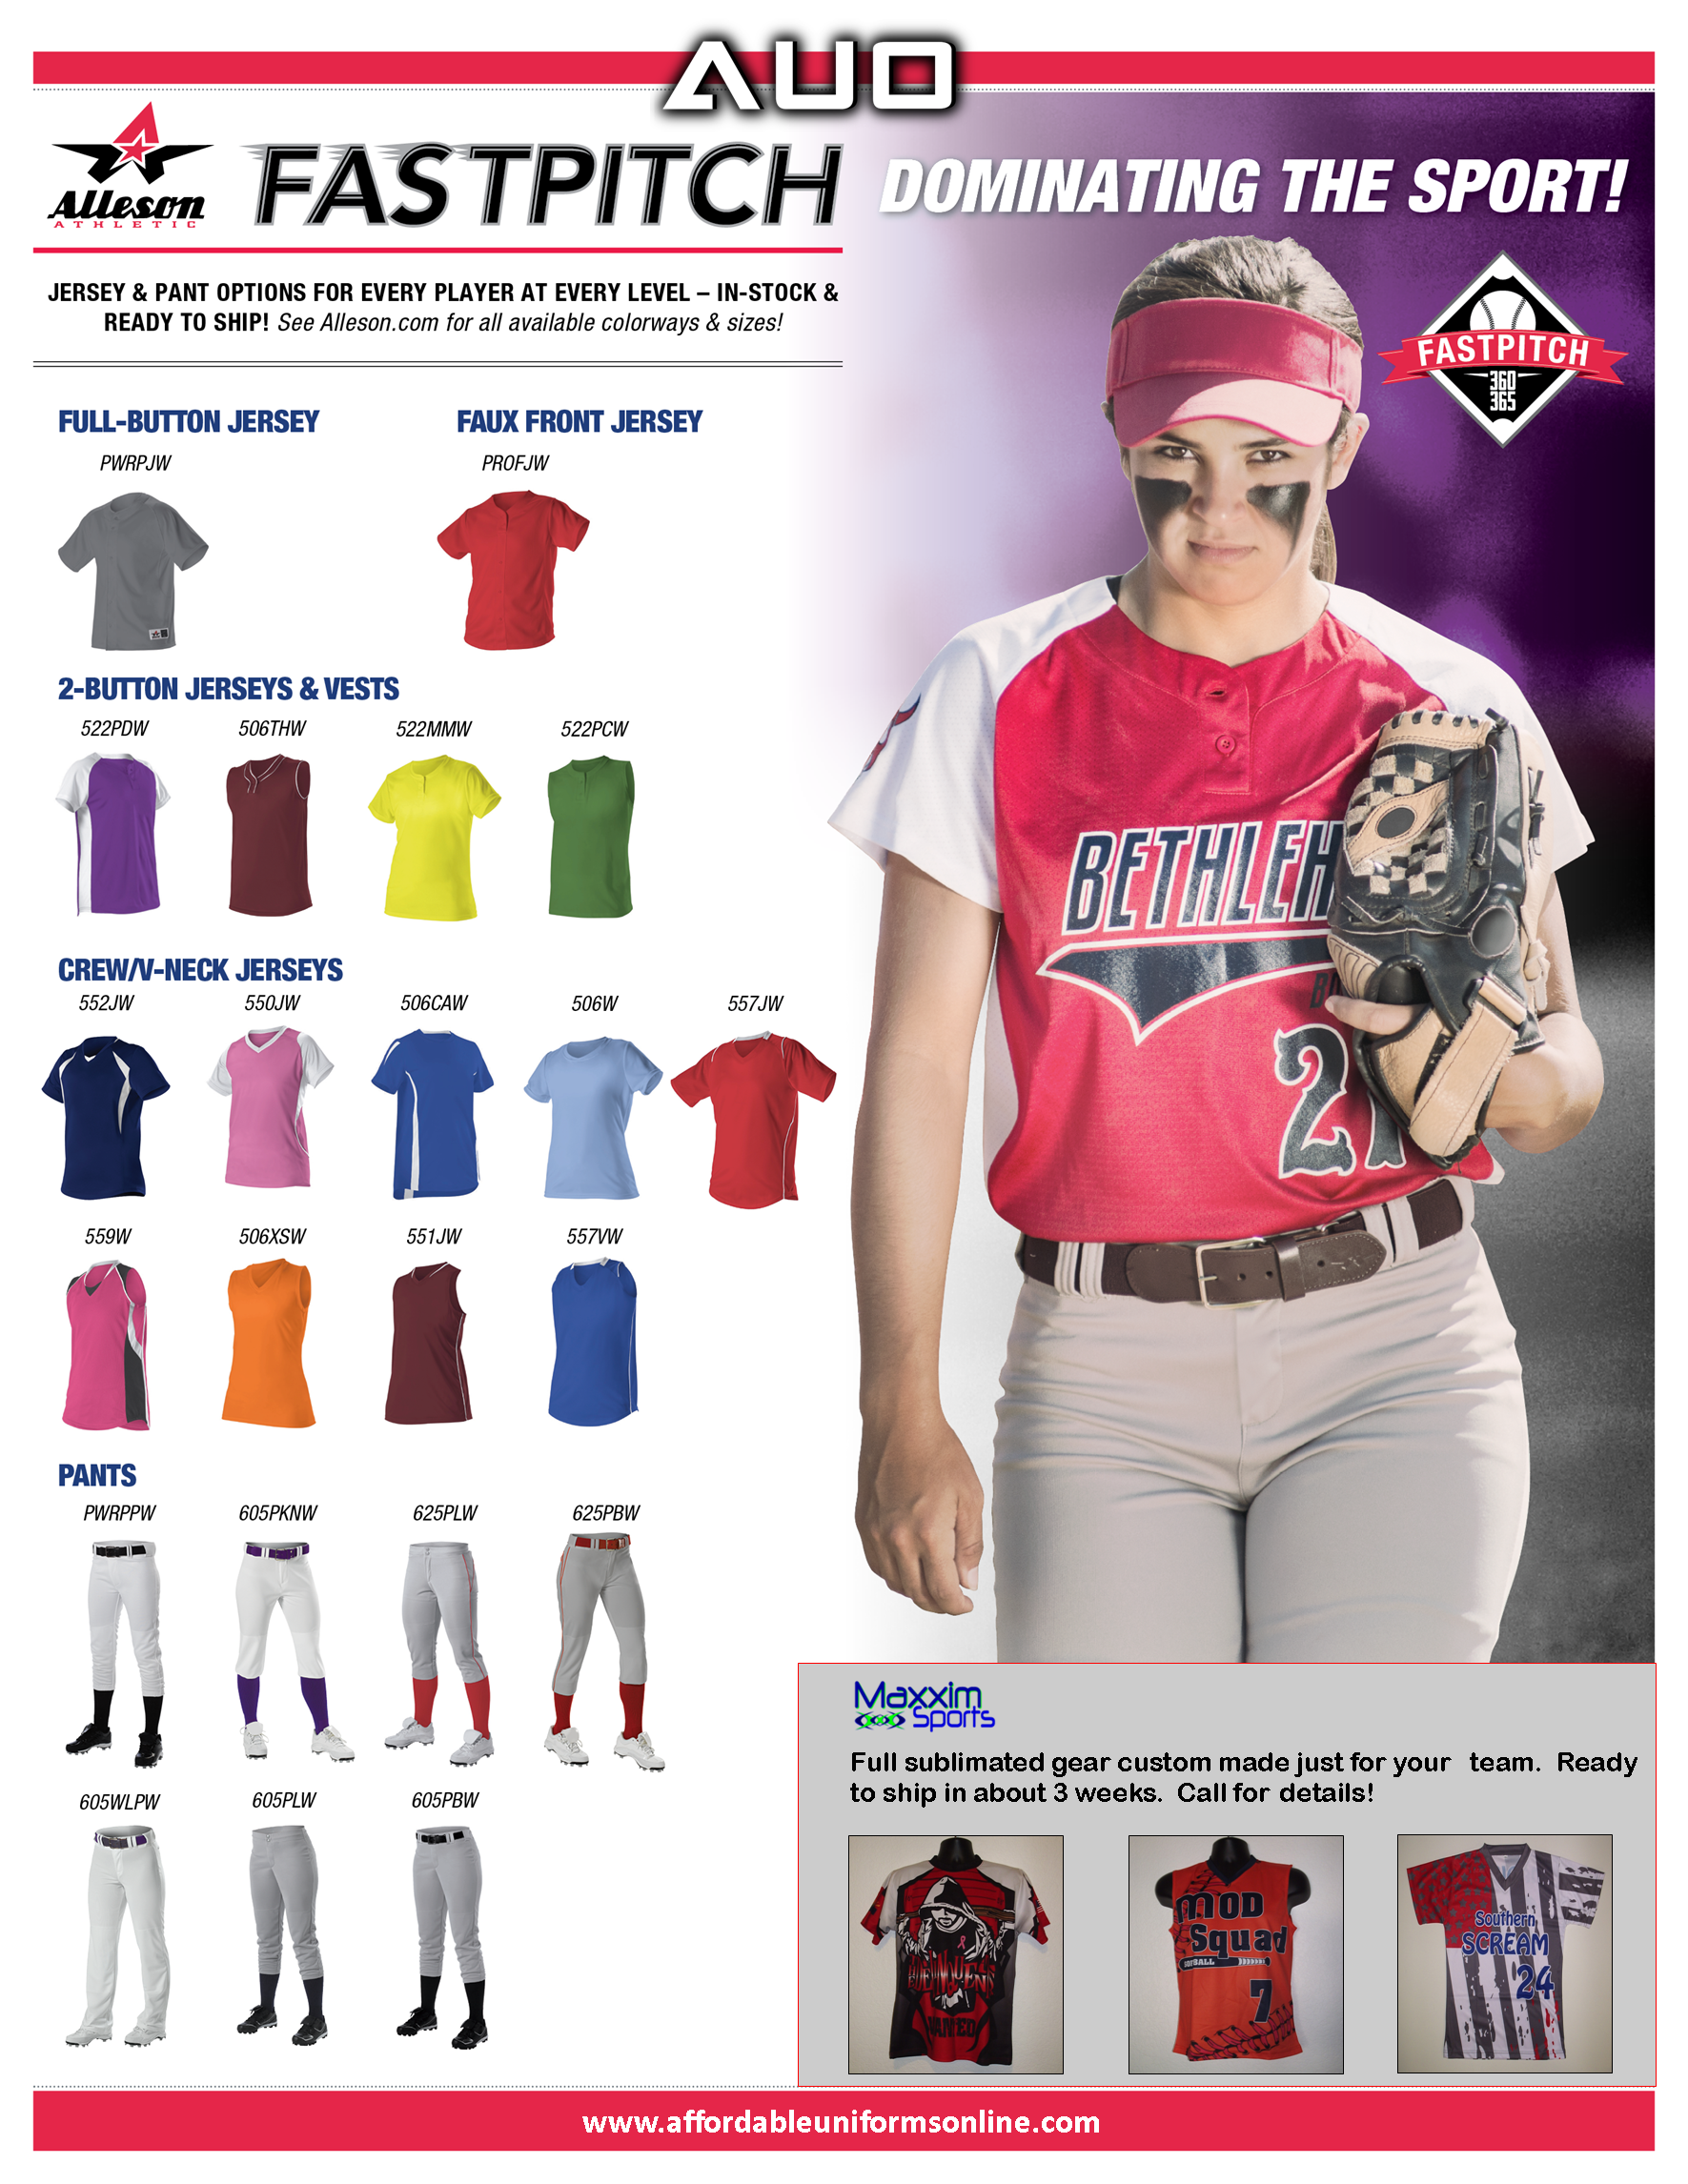 quality design 76f1c a6fc6 Custom softball uniforms created by affordable uniforms ...